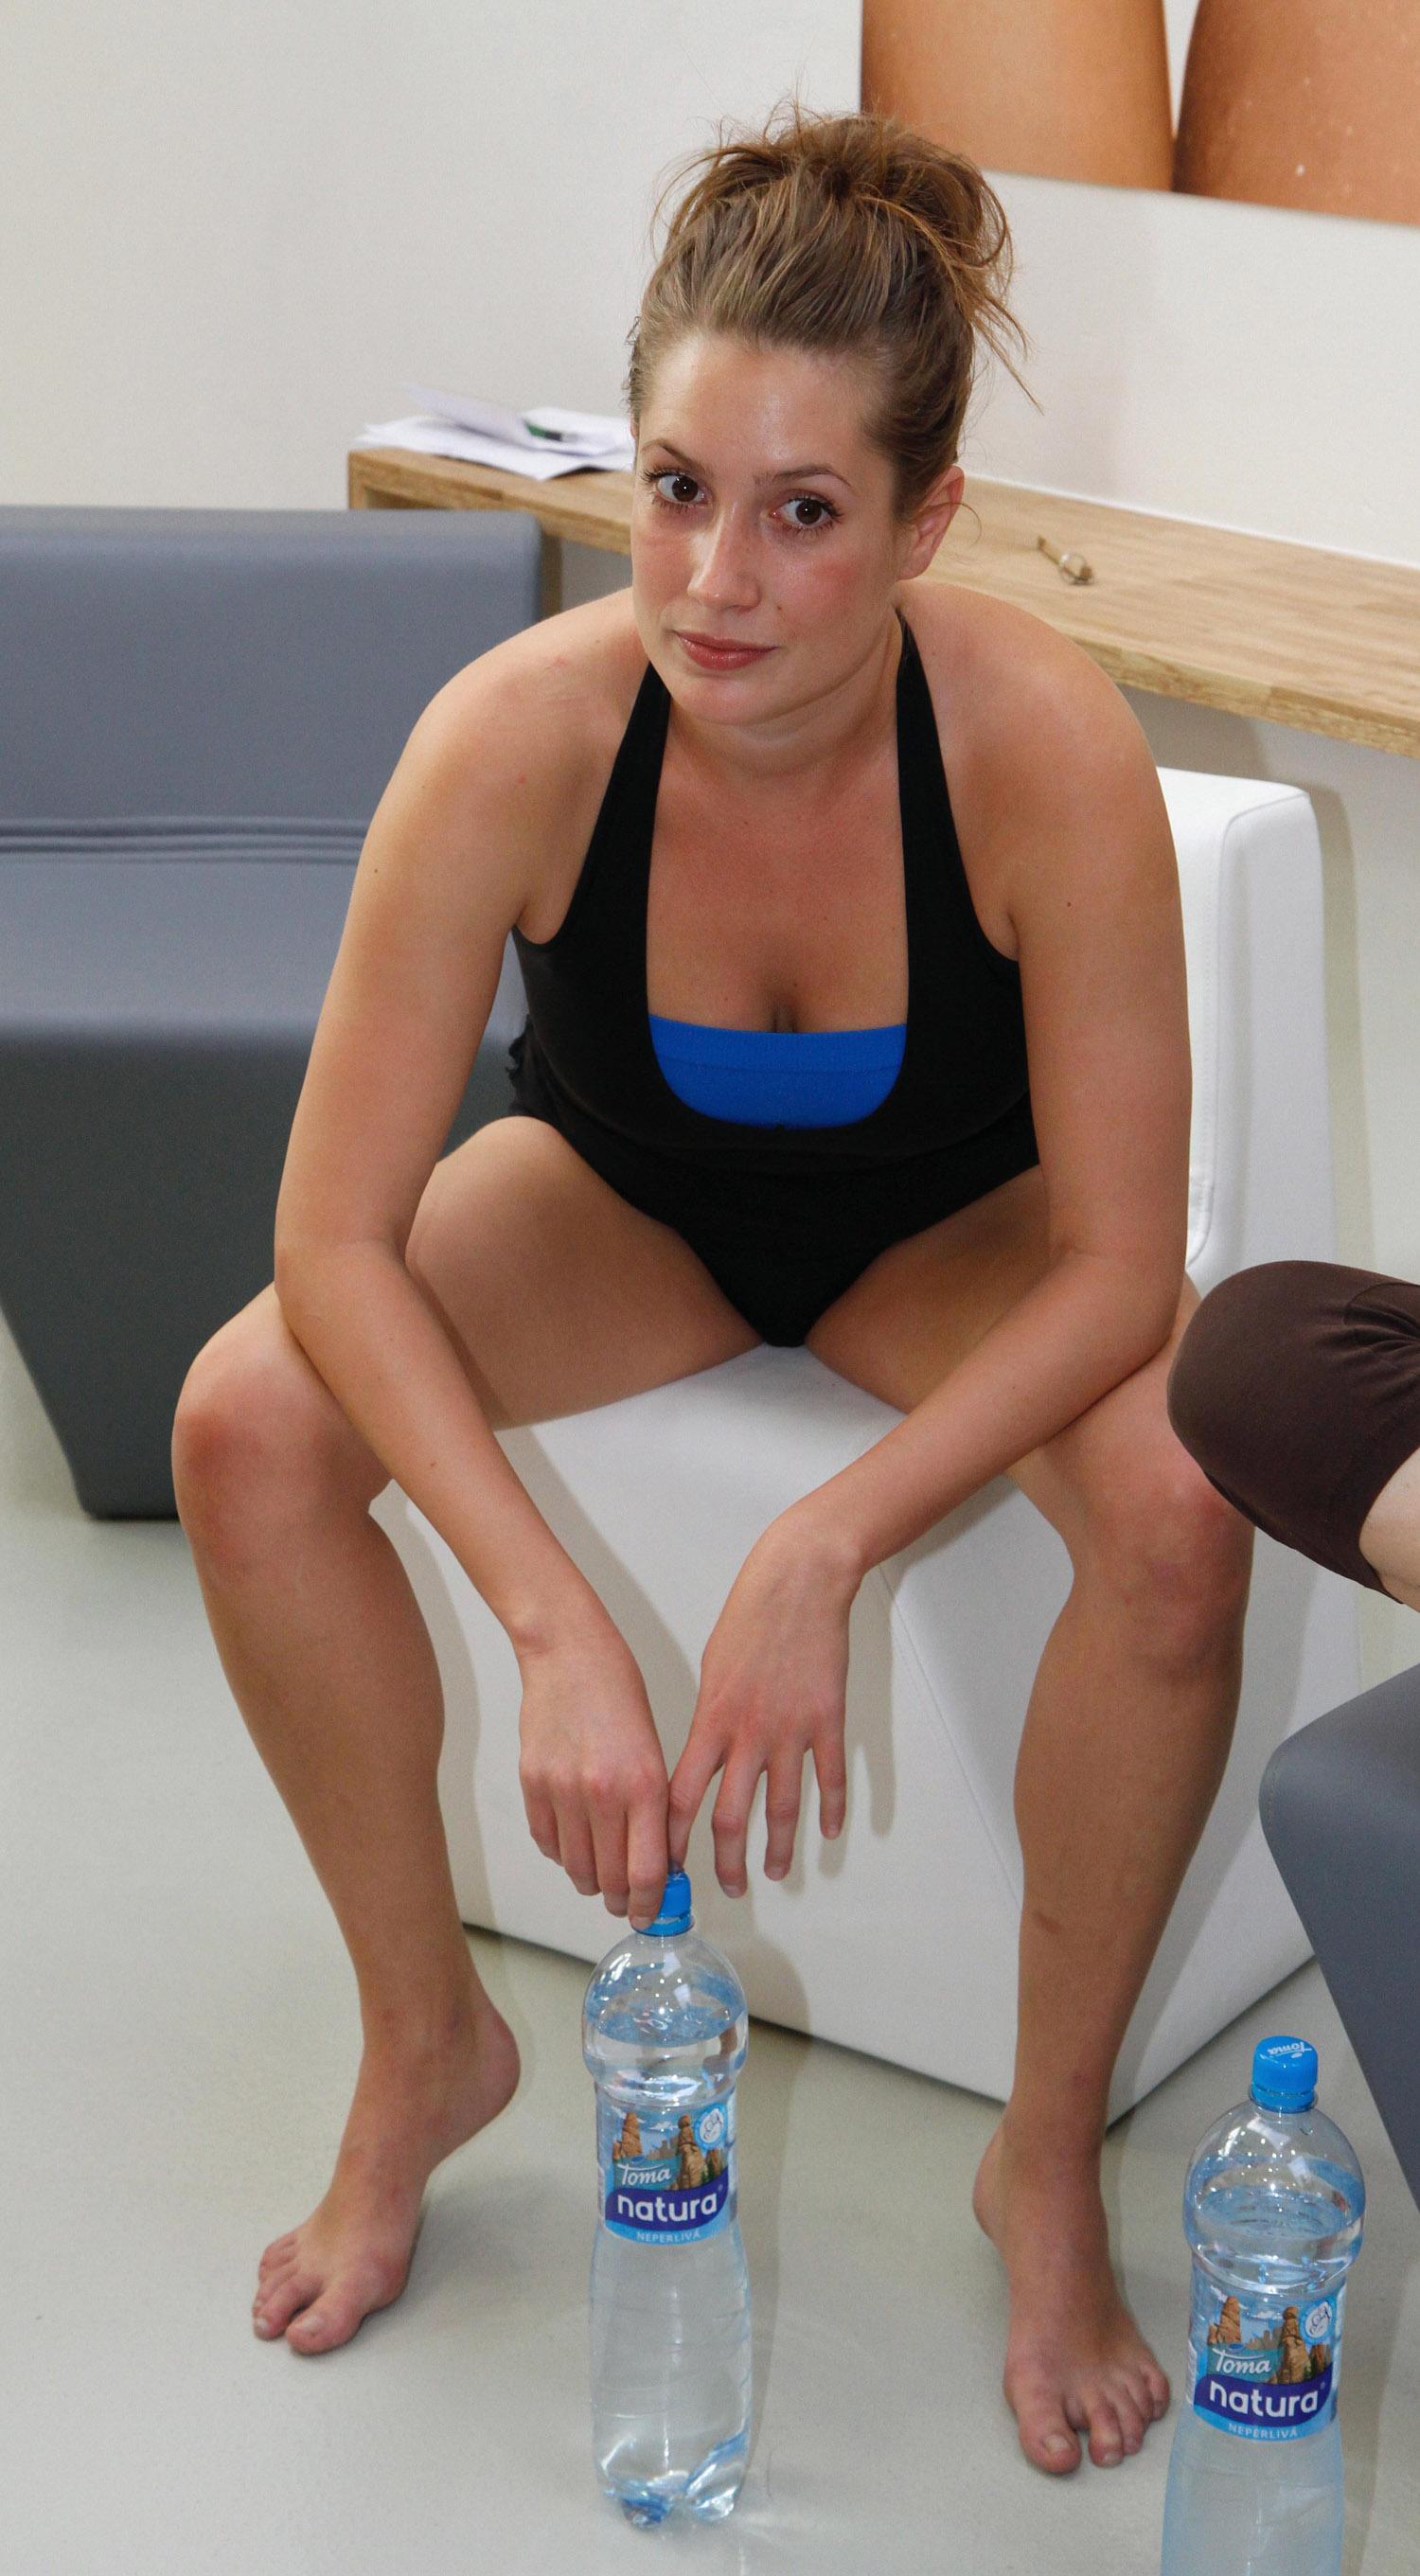 Ленка Заградницка голая. Фото - 9